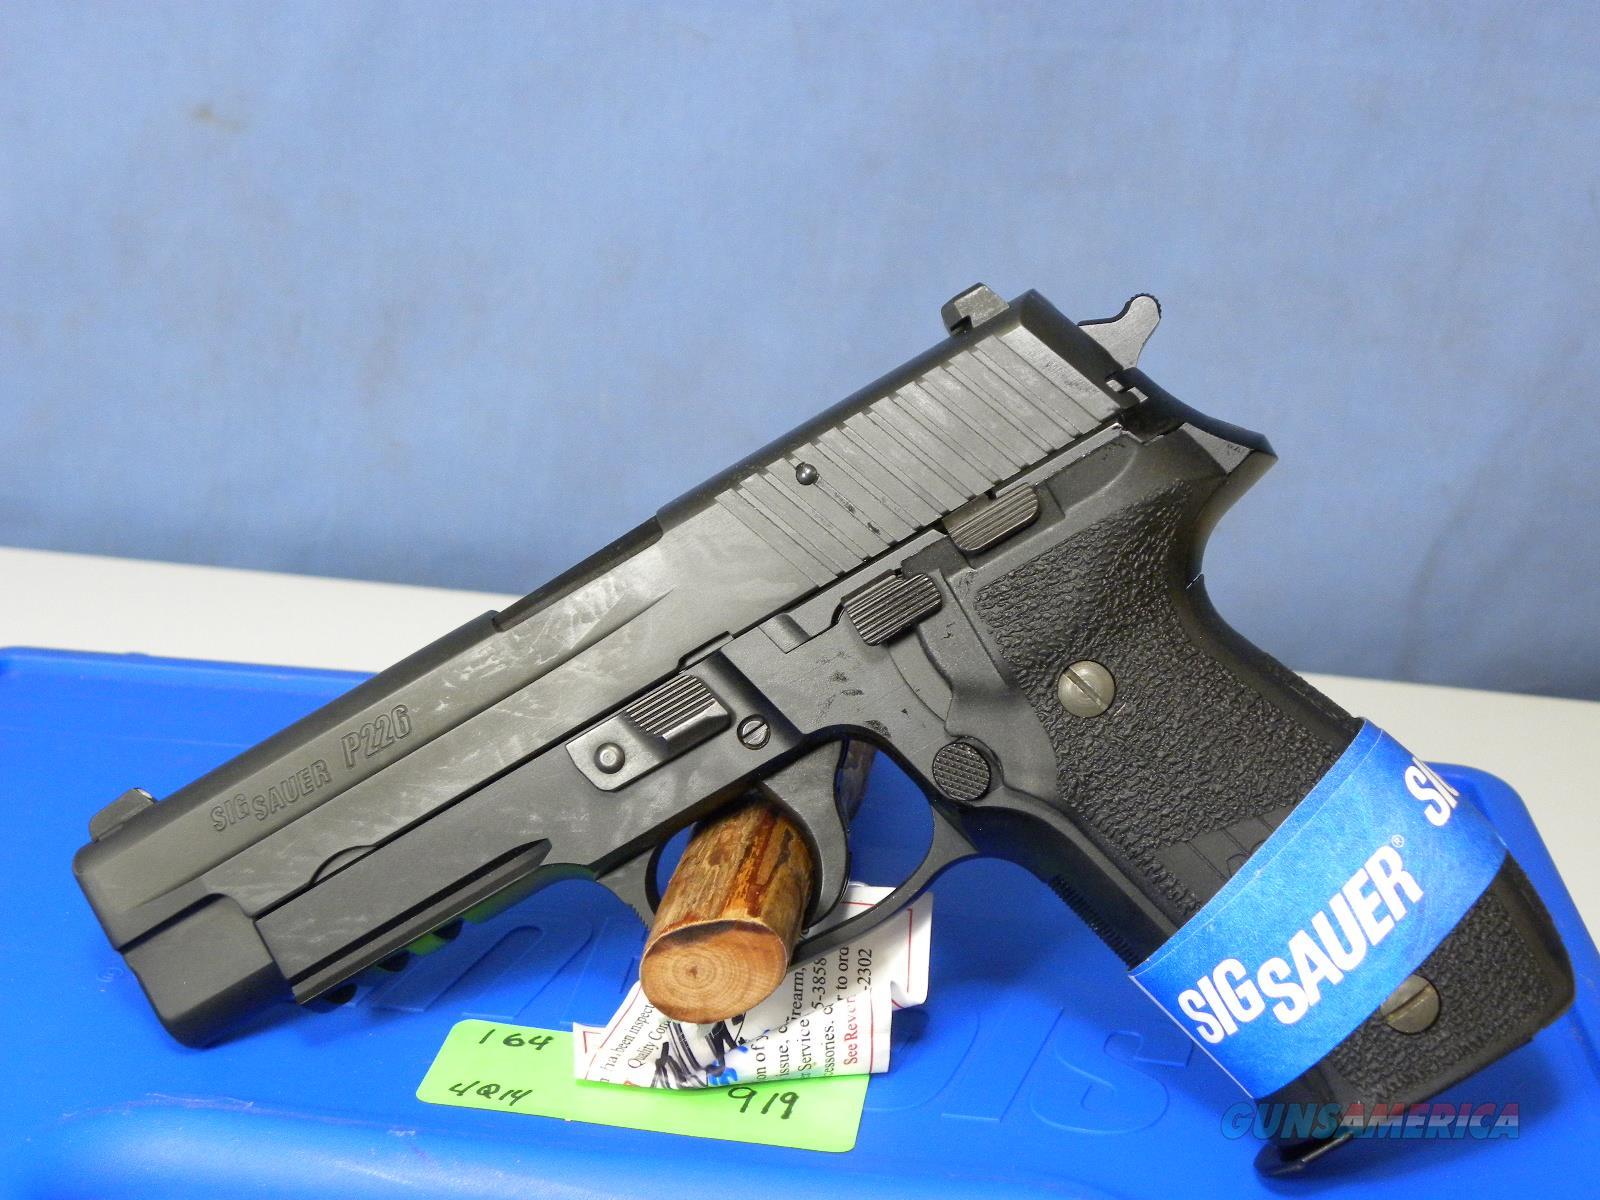 Sig Sauer 226R-40-BSS  Guns > Pistols > Sig - Sauer/Sigarms Pistols > P226